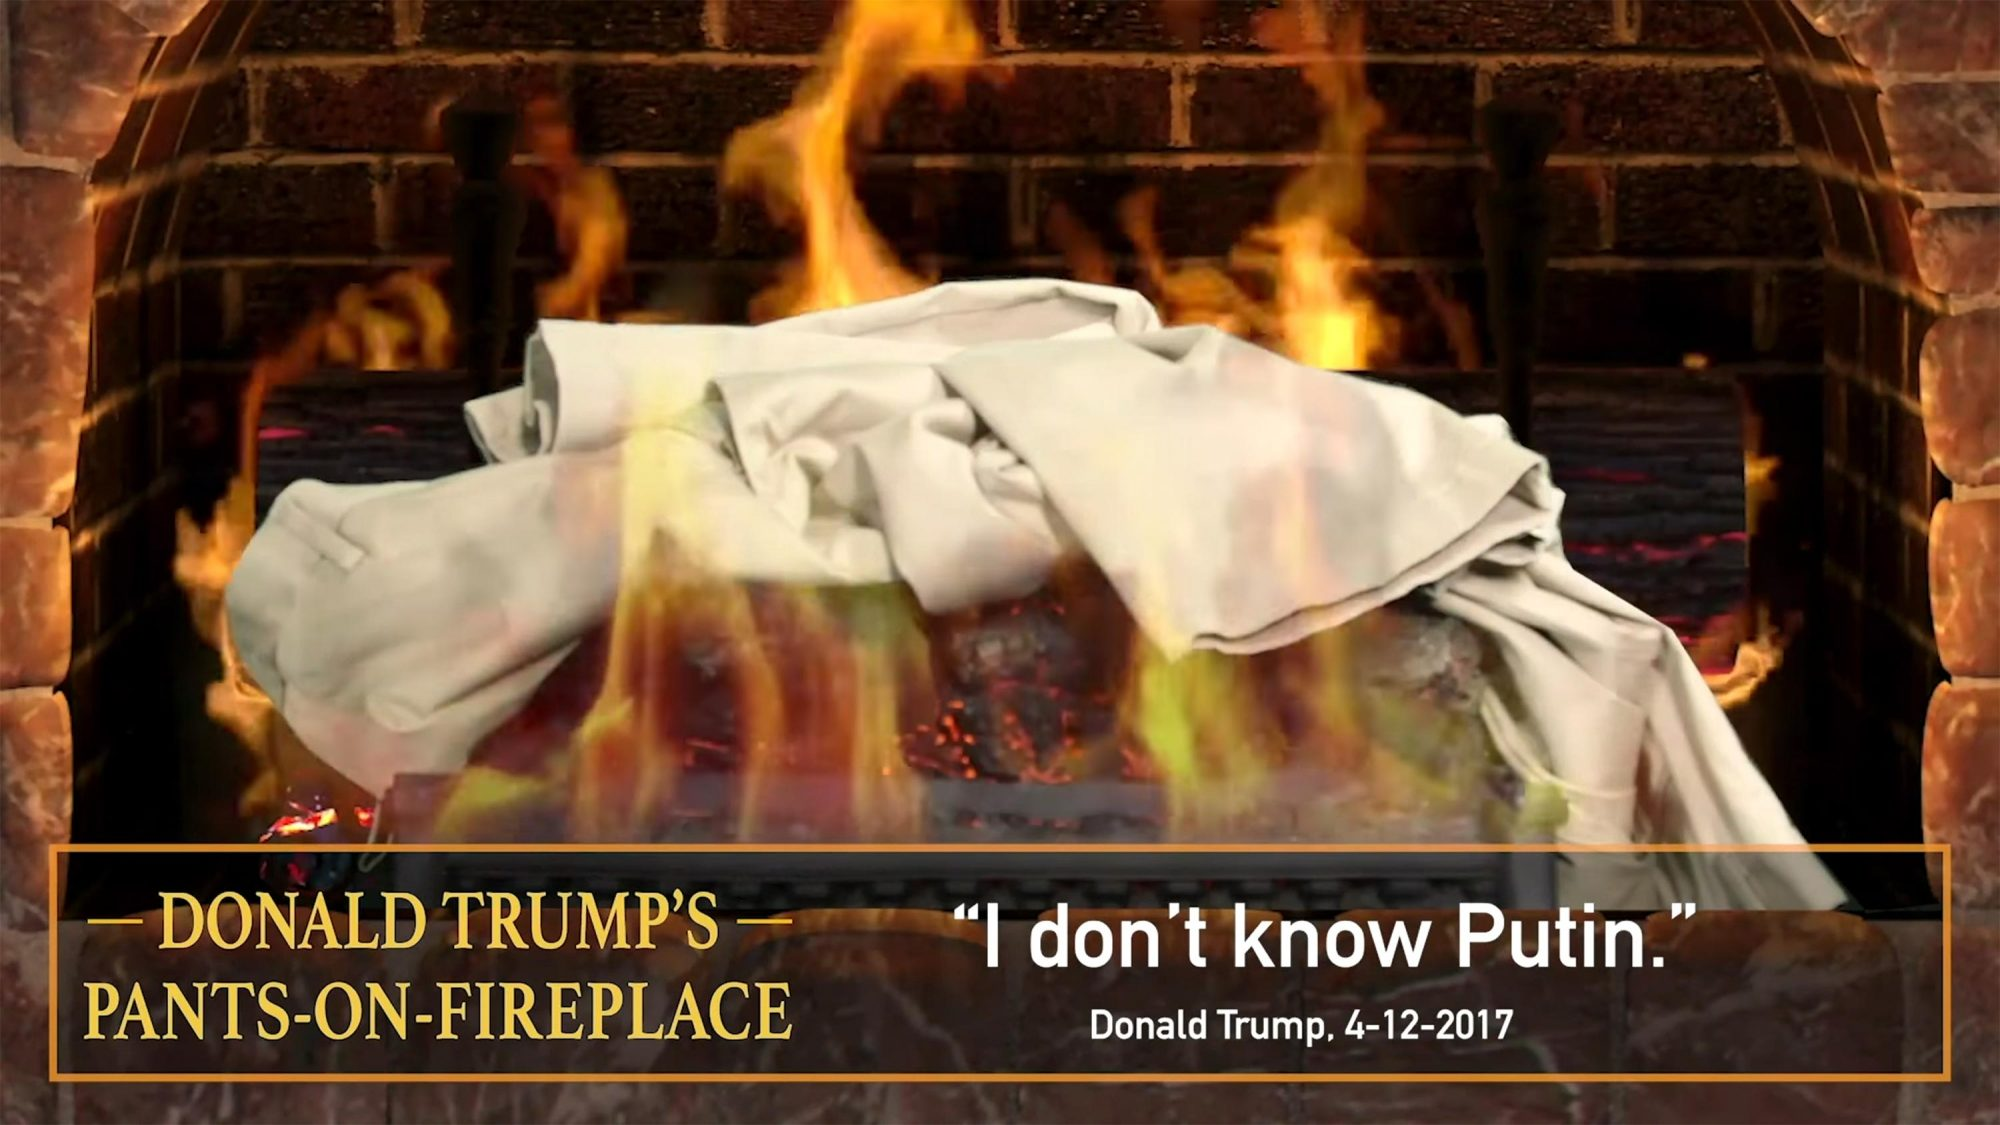 Pants-on-Fireplace